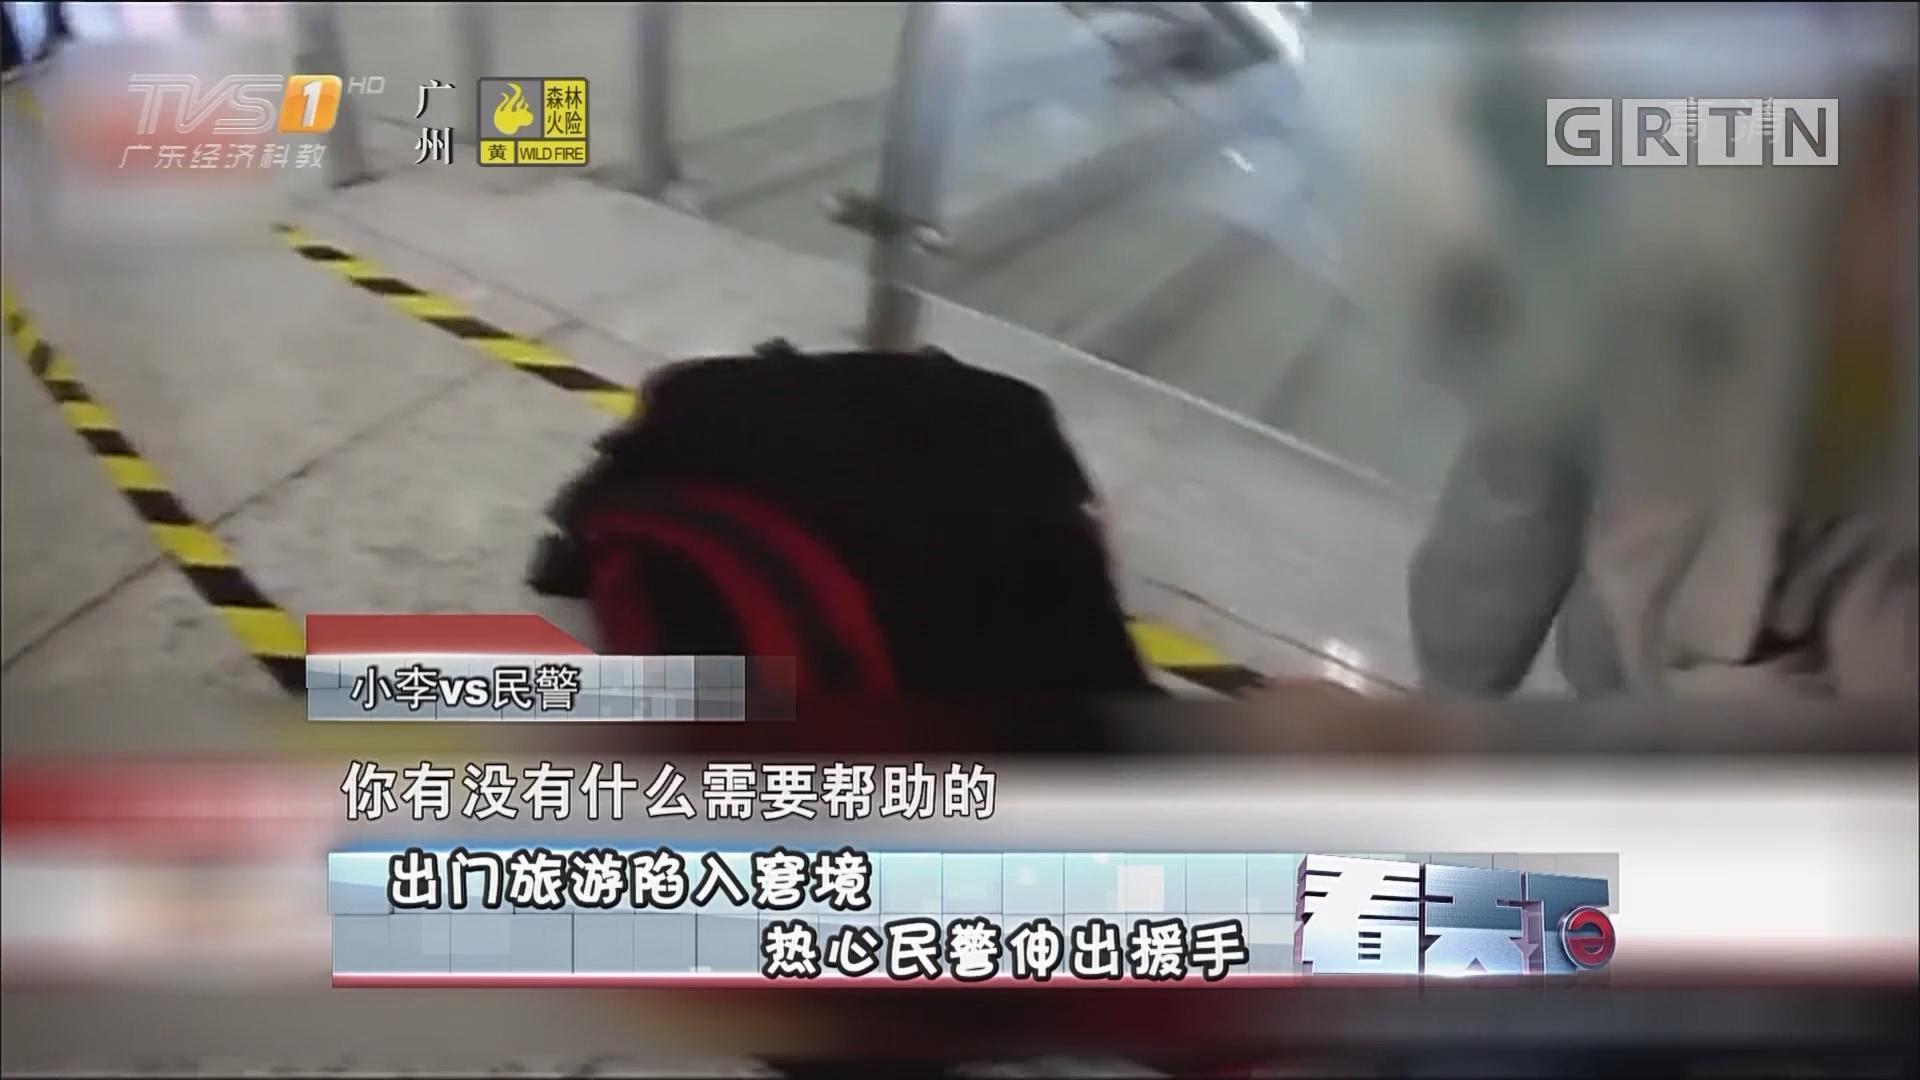 [HD][2018-03-14]看天下:出门旅游陷入窘境 热心民警伸出援手